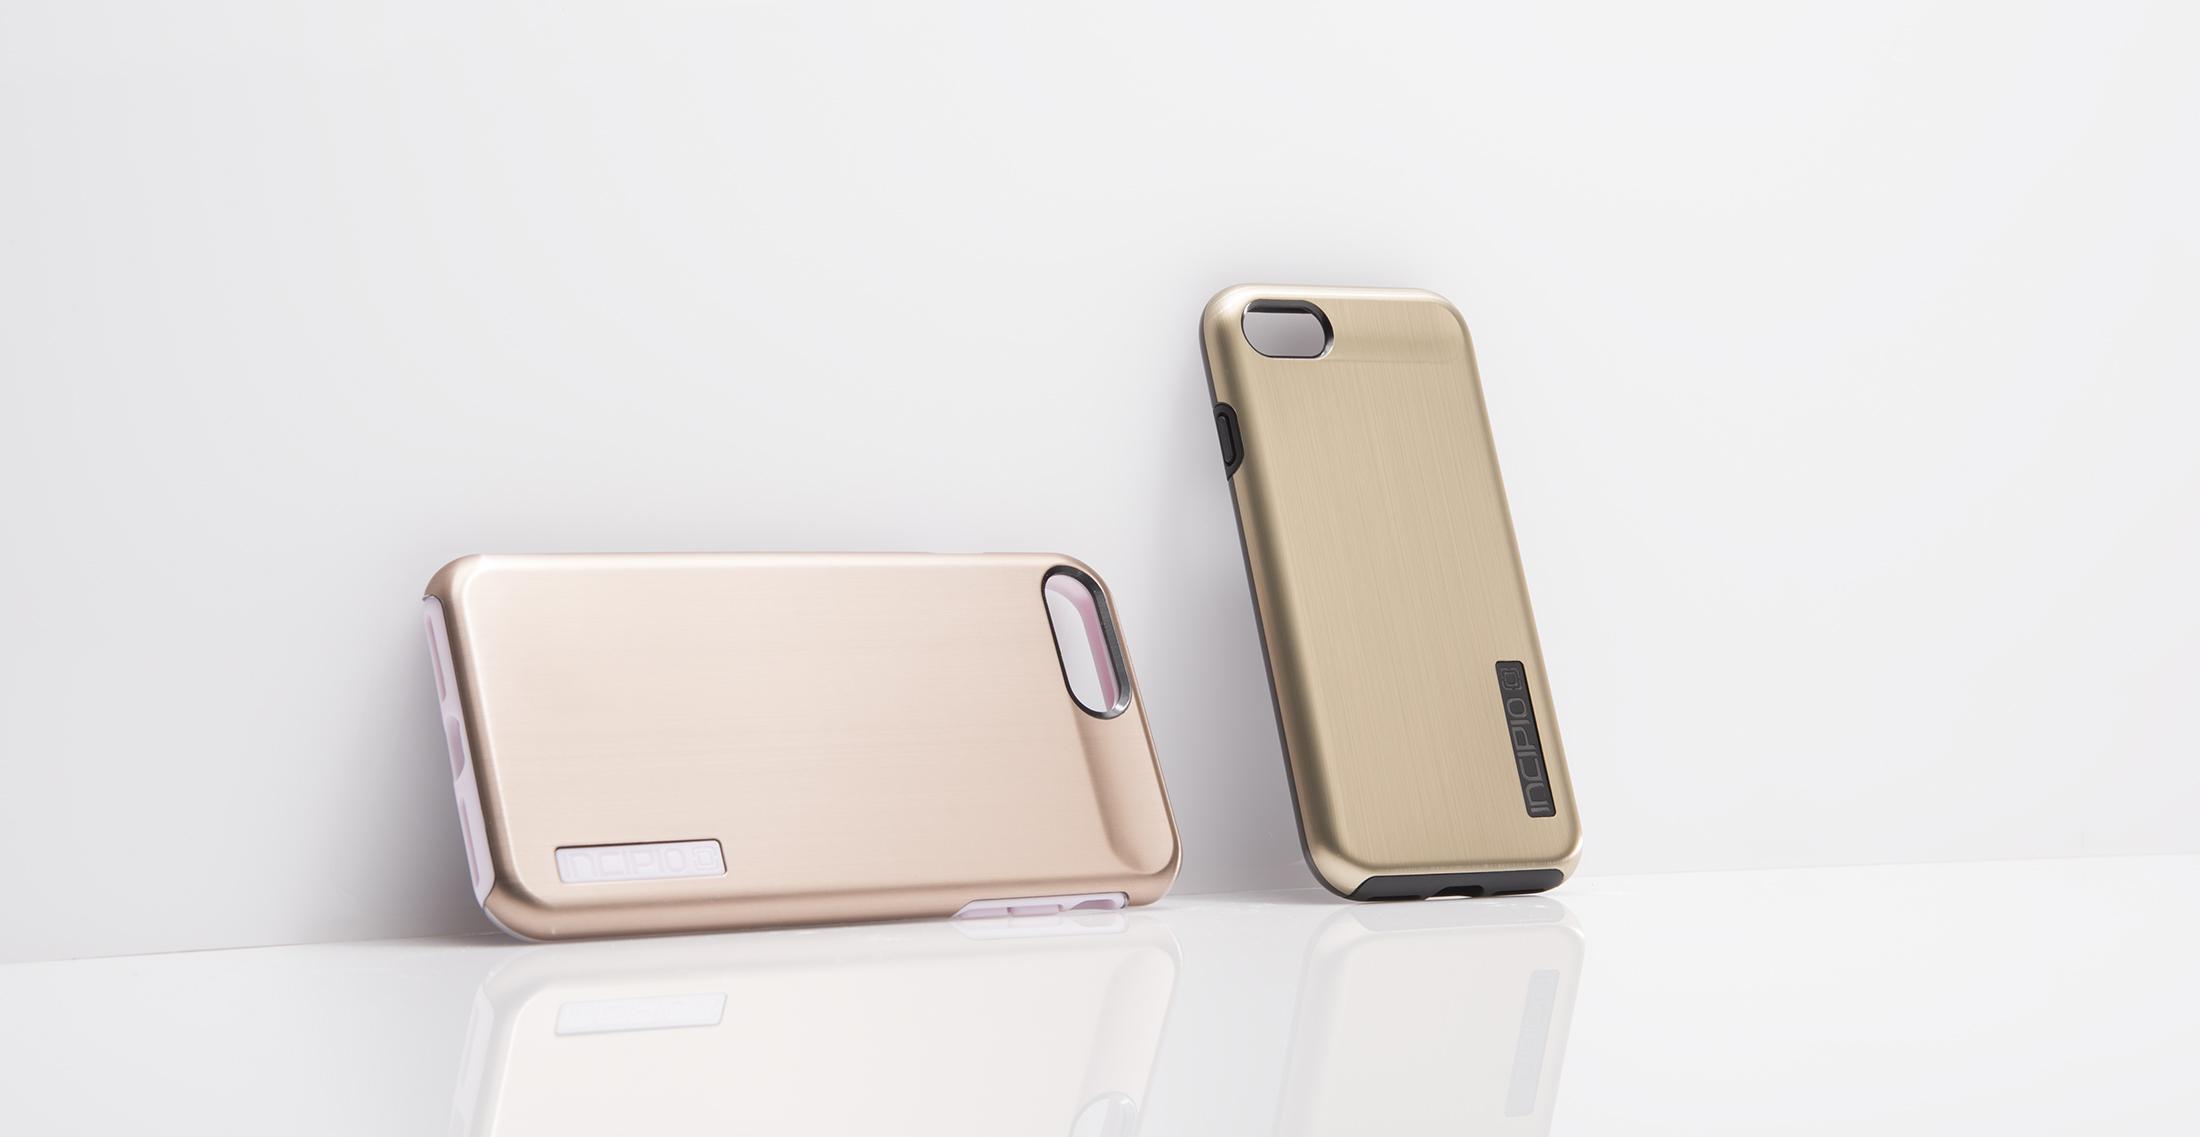 iPhoneX_Cases_9_170293_WEB.jpg